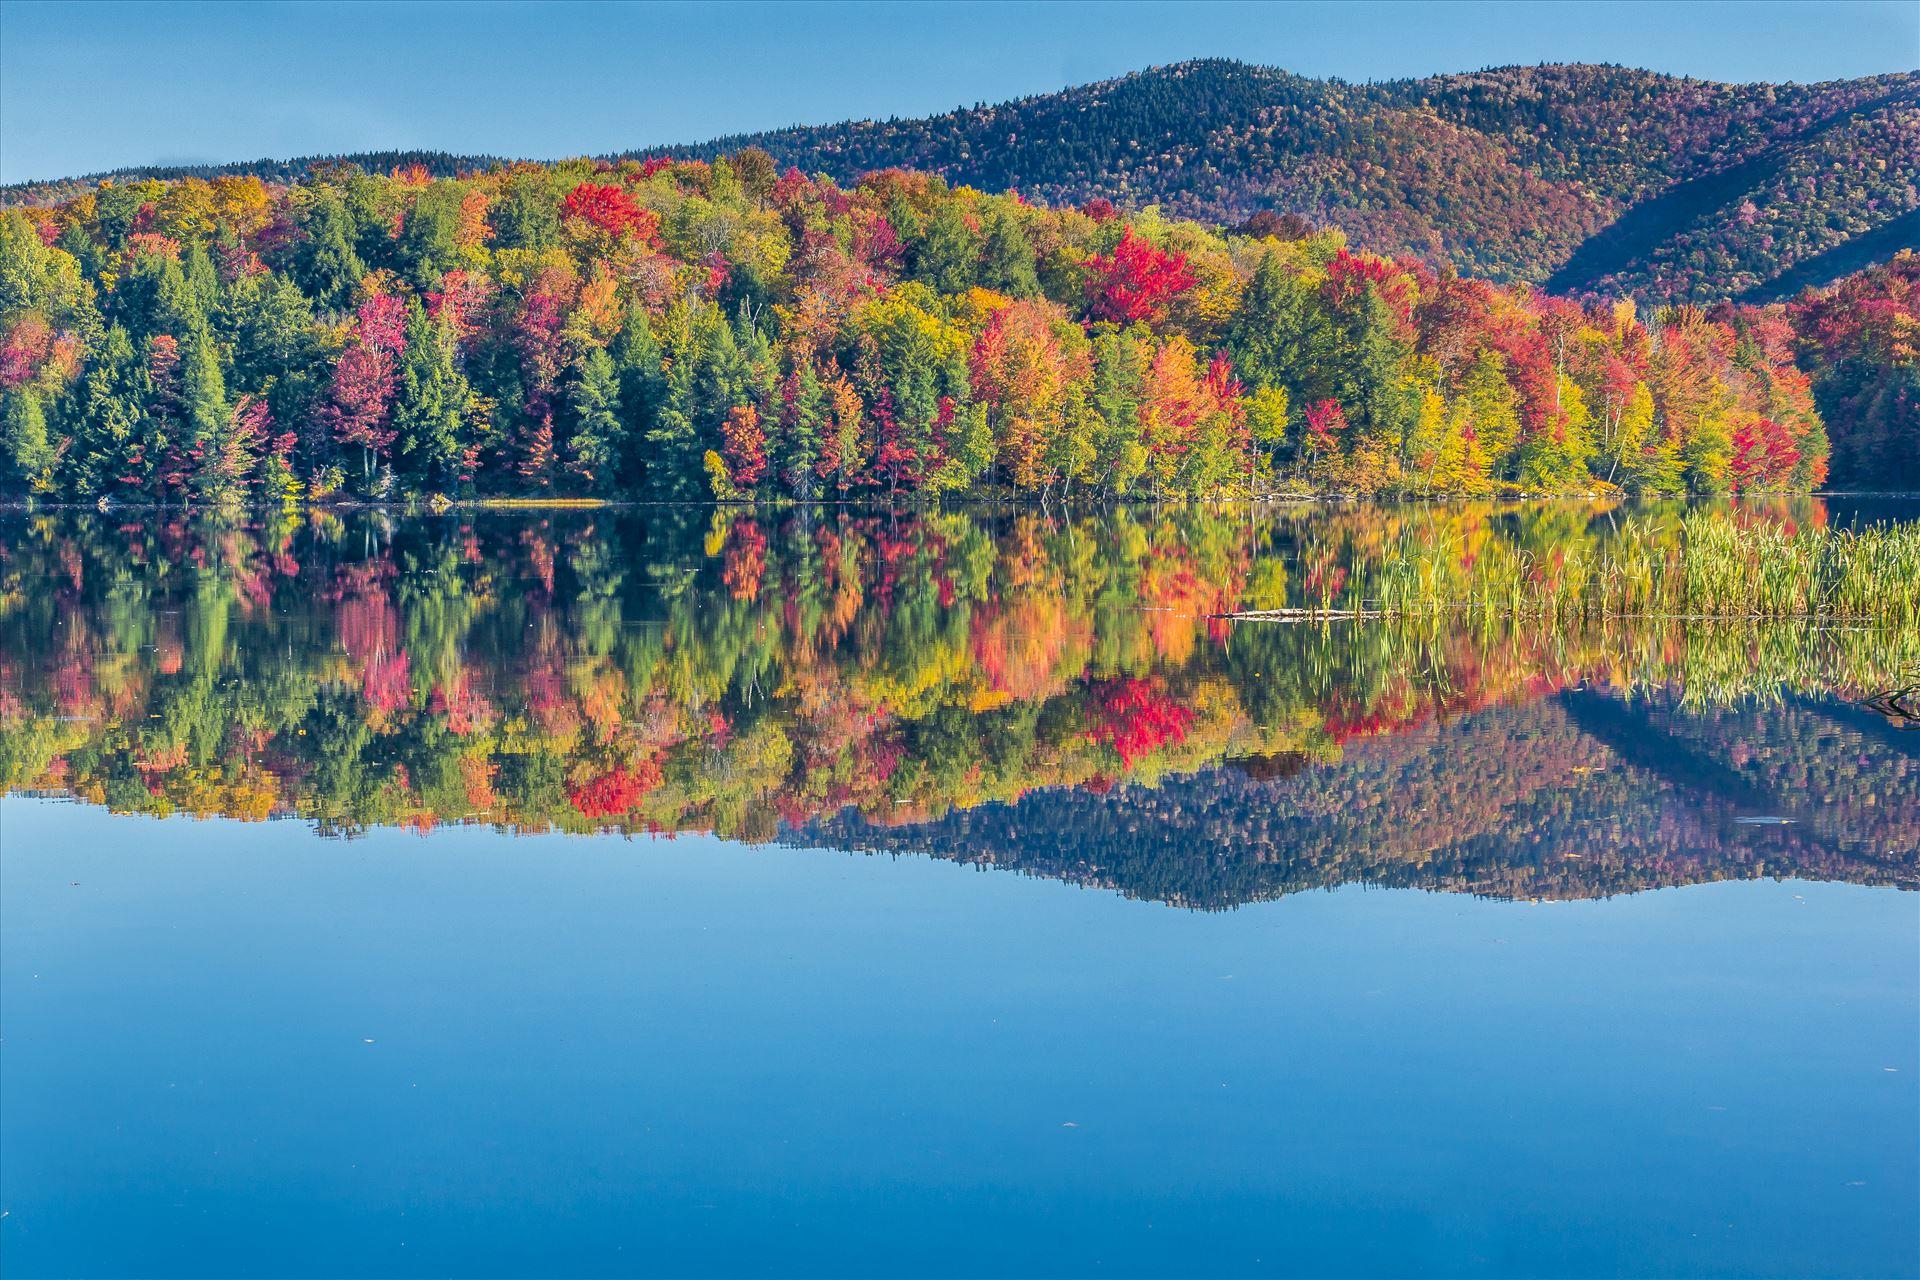 New England Fall Foliage Desktop Wallpaper Vermont Fall Foliage Bob Innella Photography